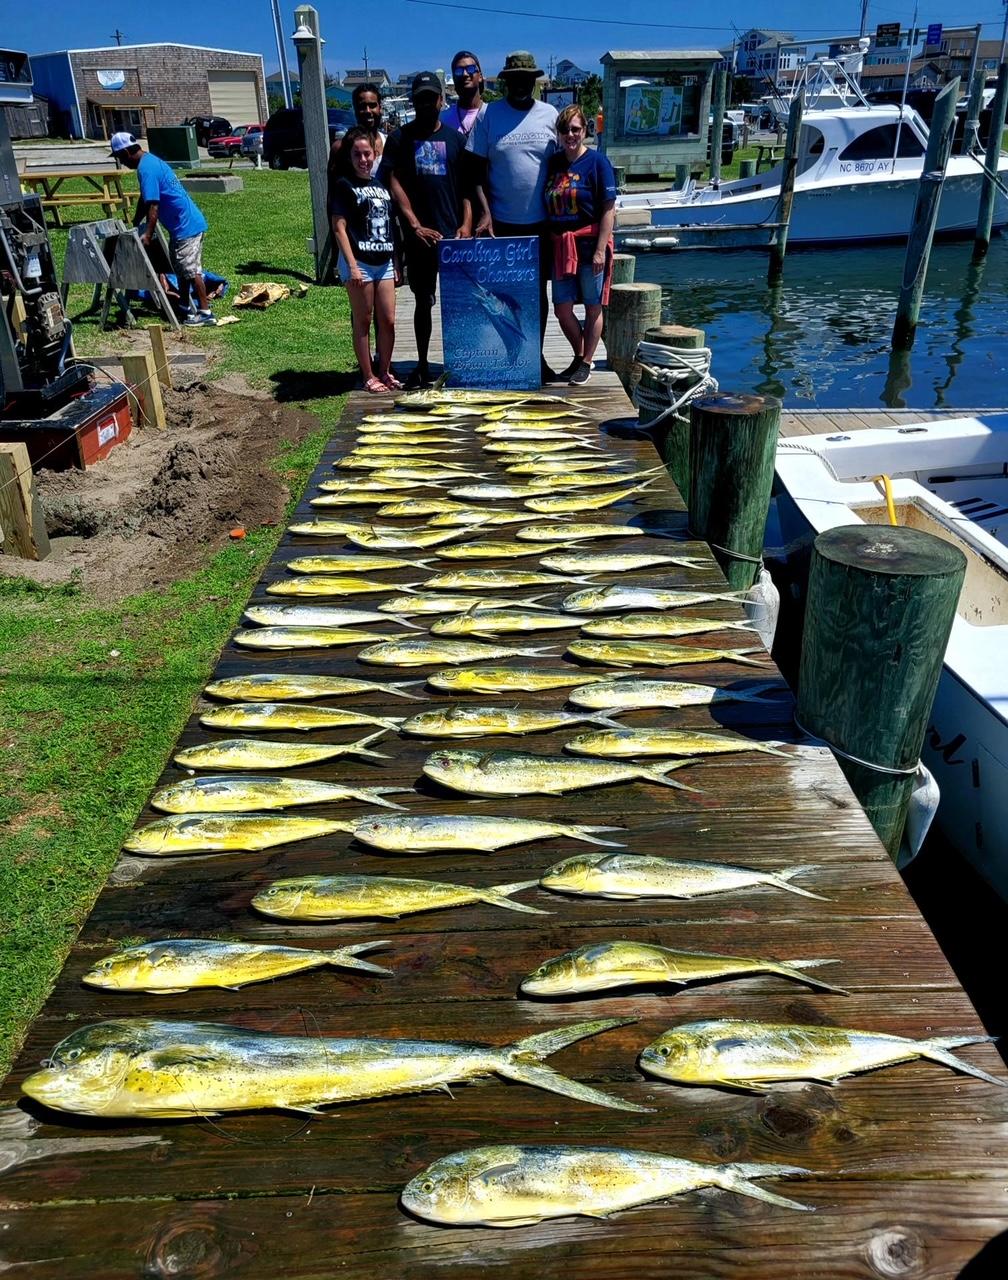 Carolina Girl Hatteras Offshore Fishing Charters Teach's Lair Marina